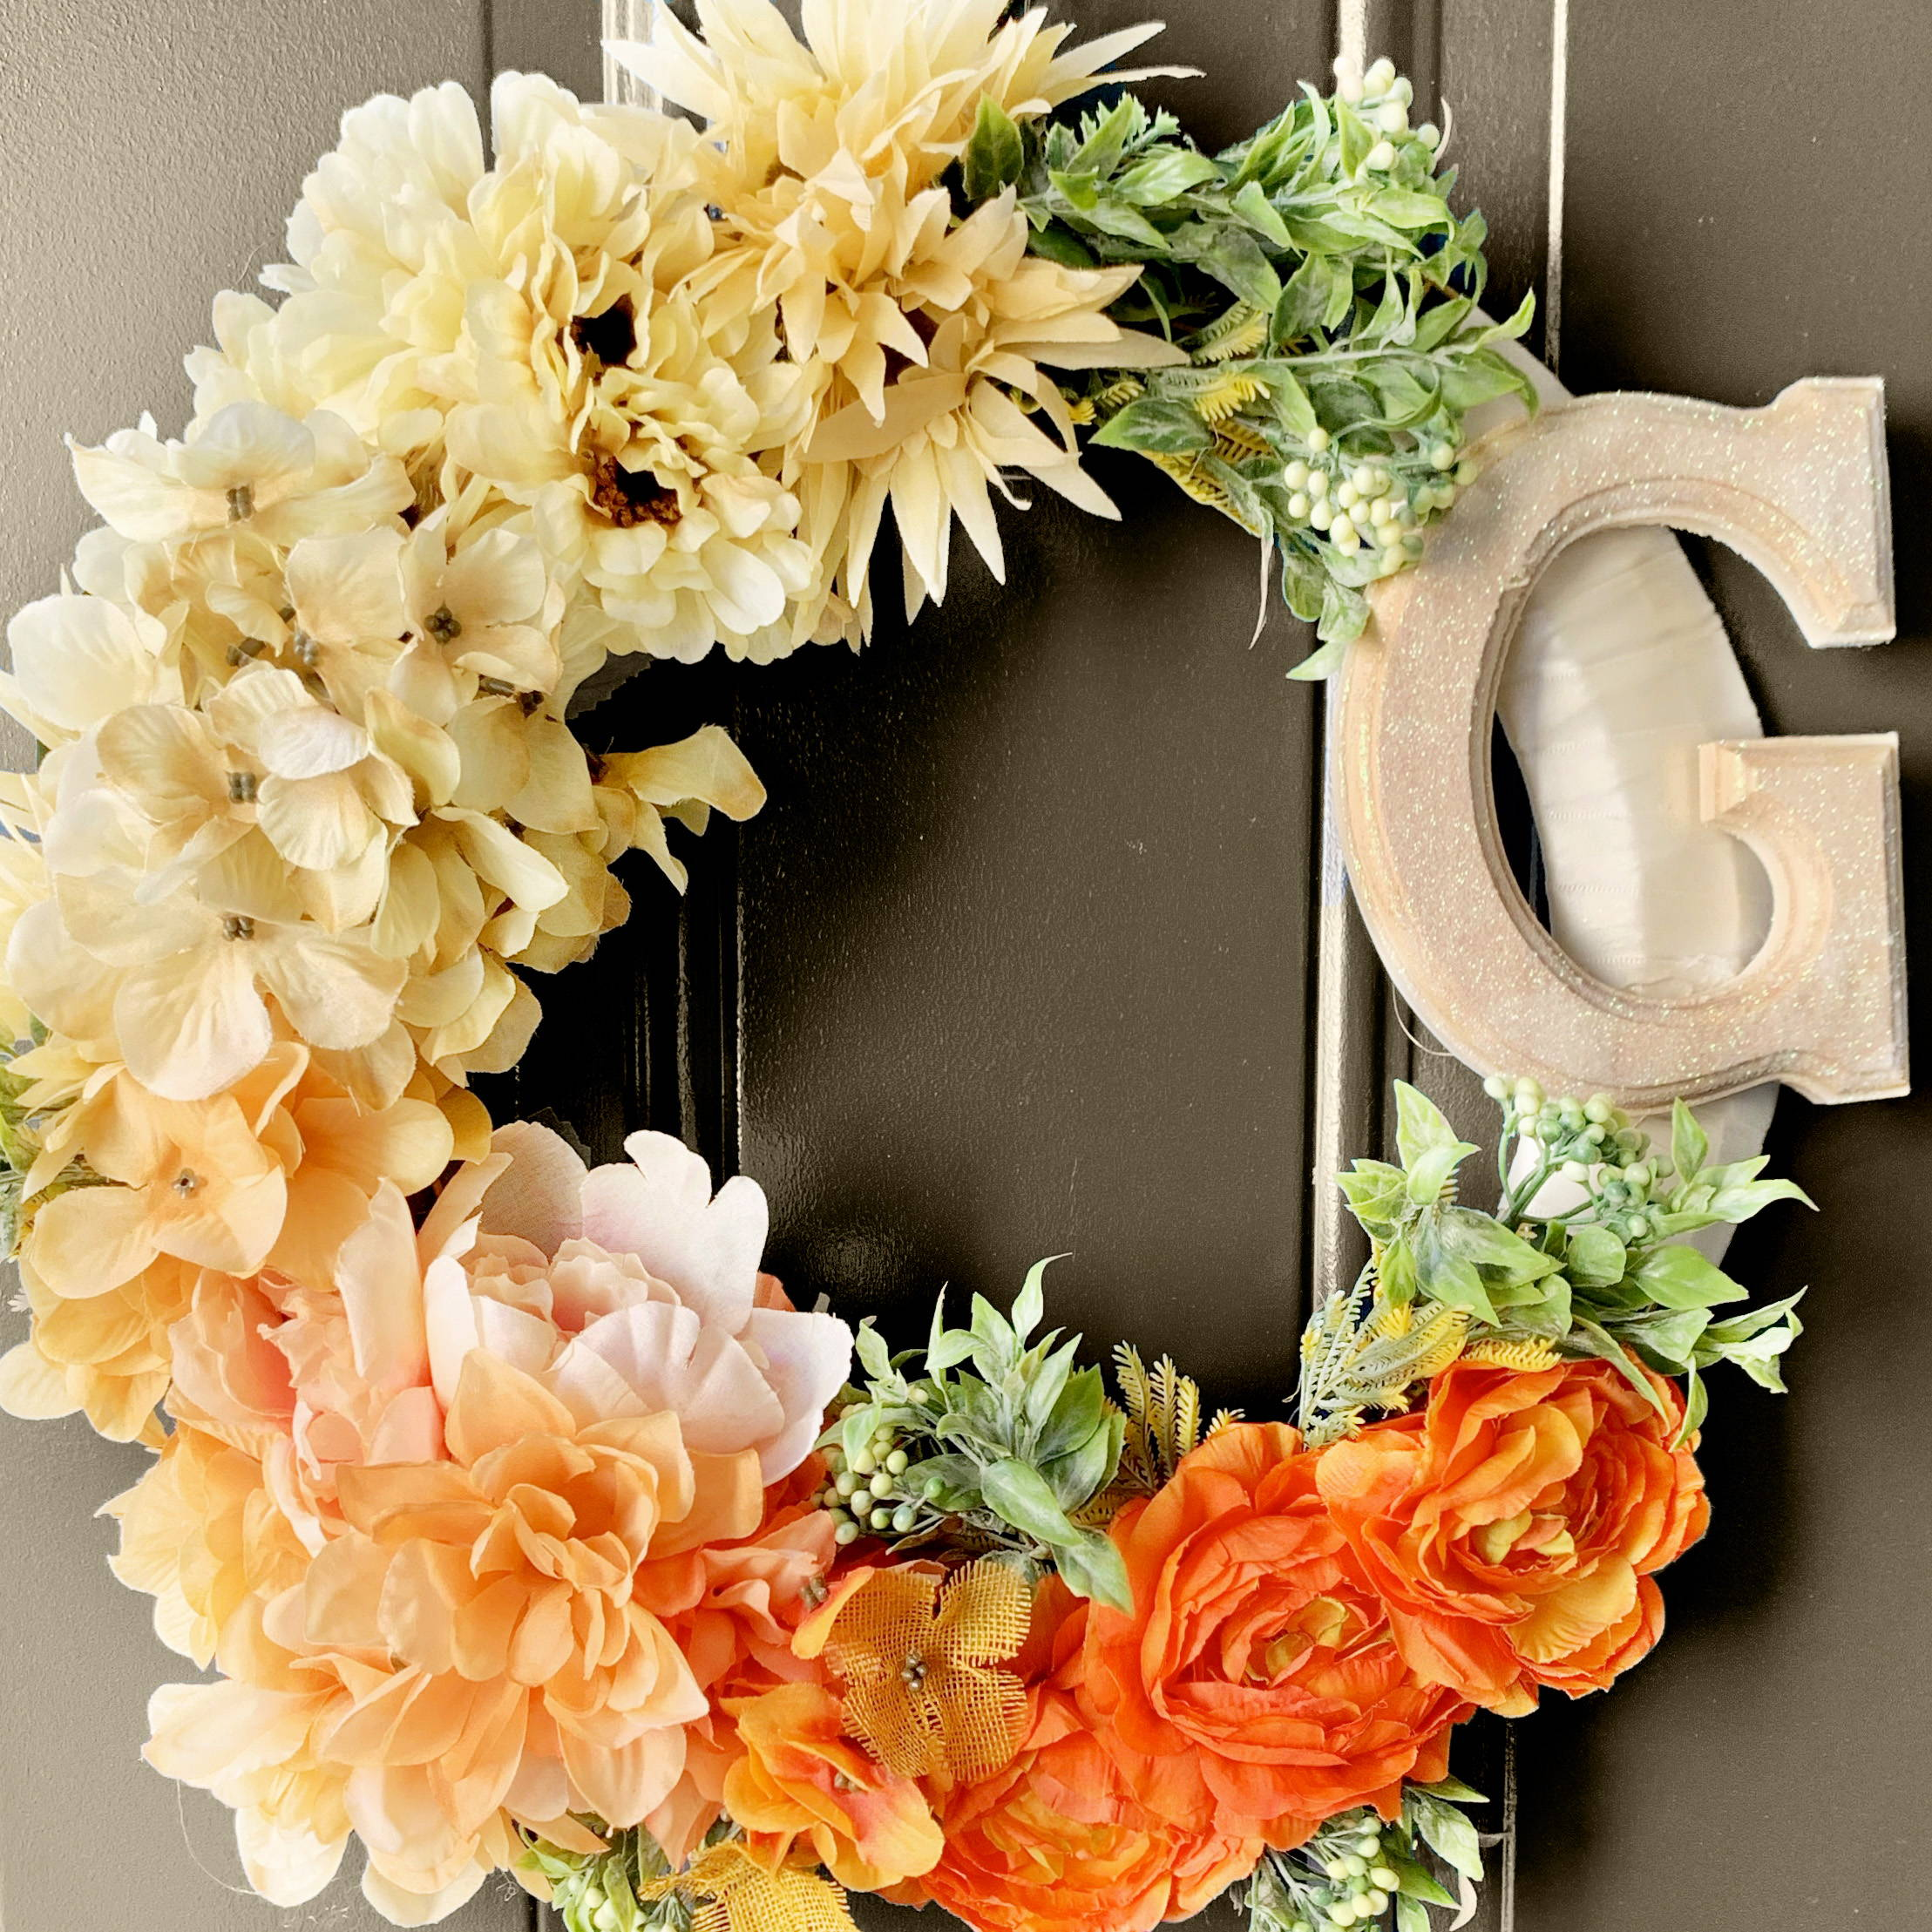 Handmade Holiday Floral Wreath